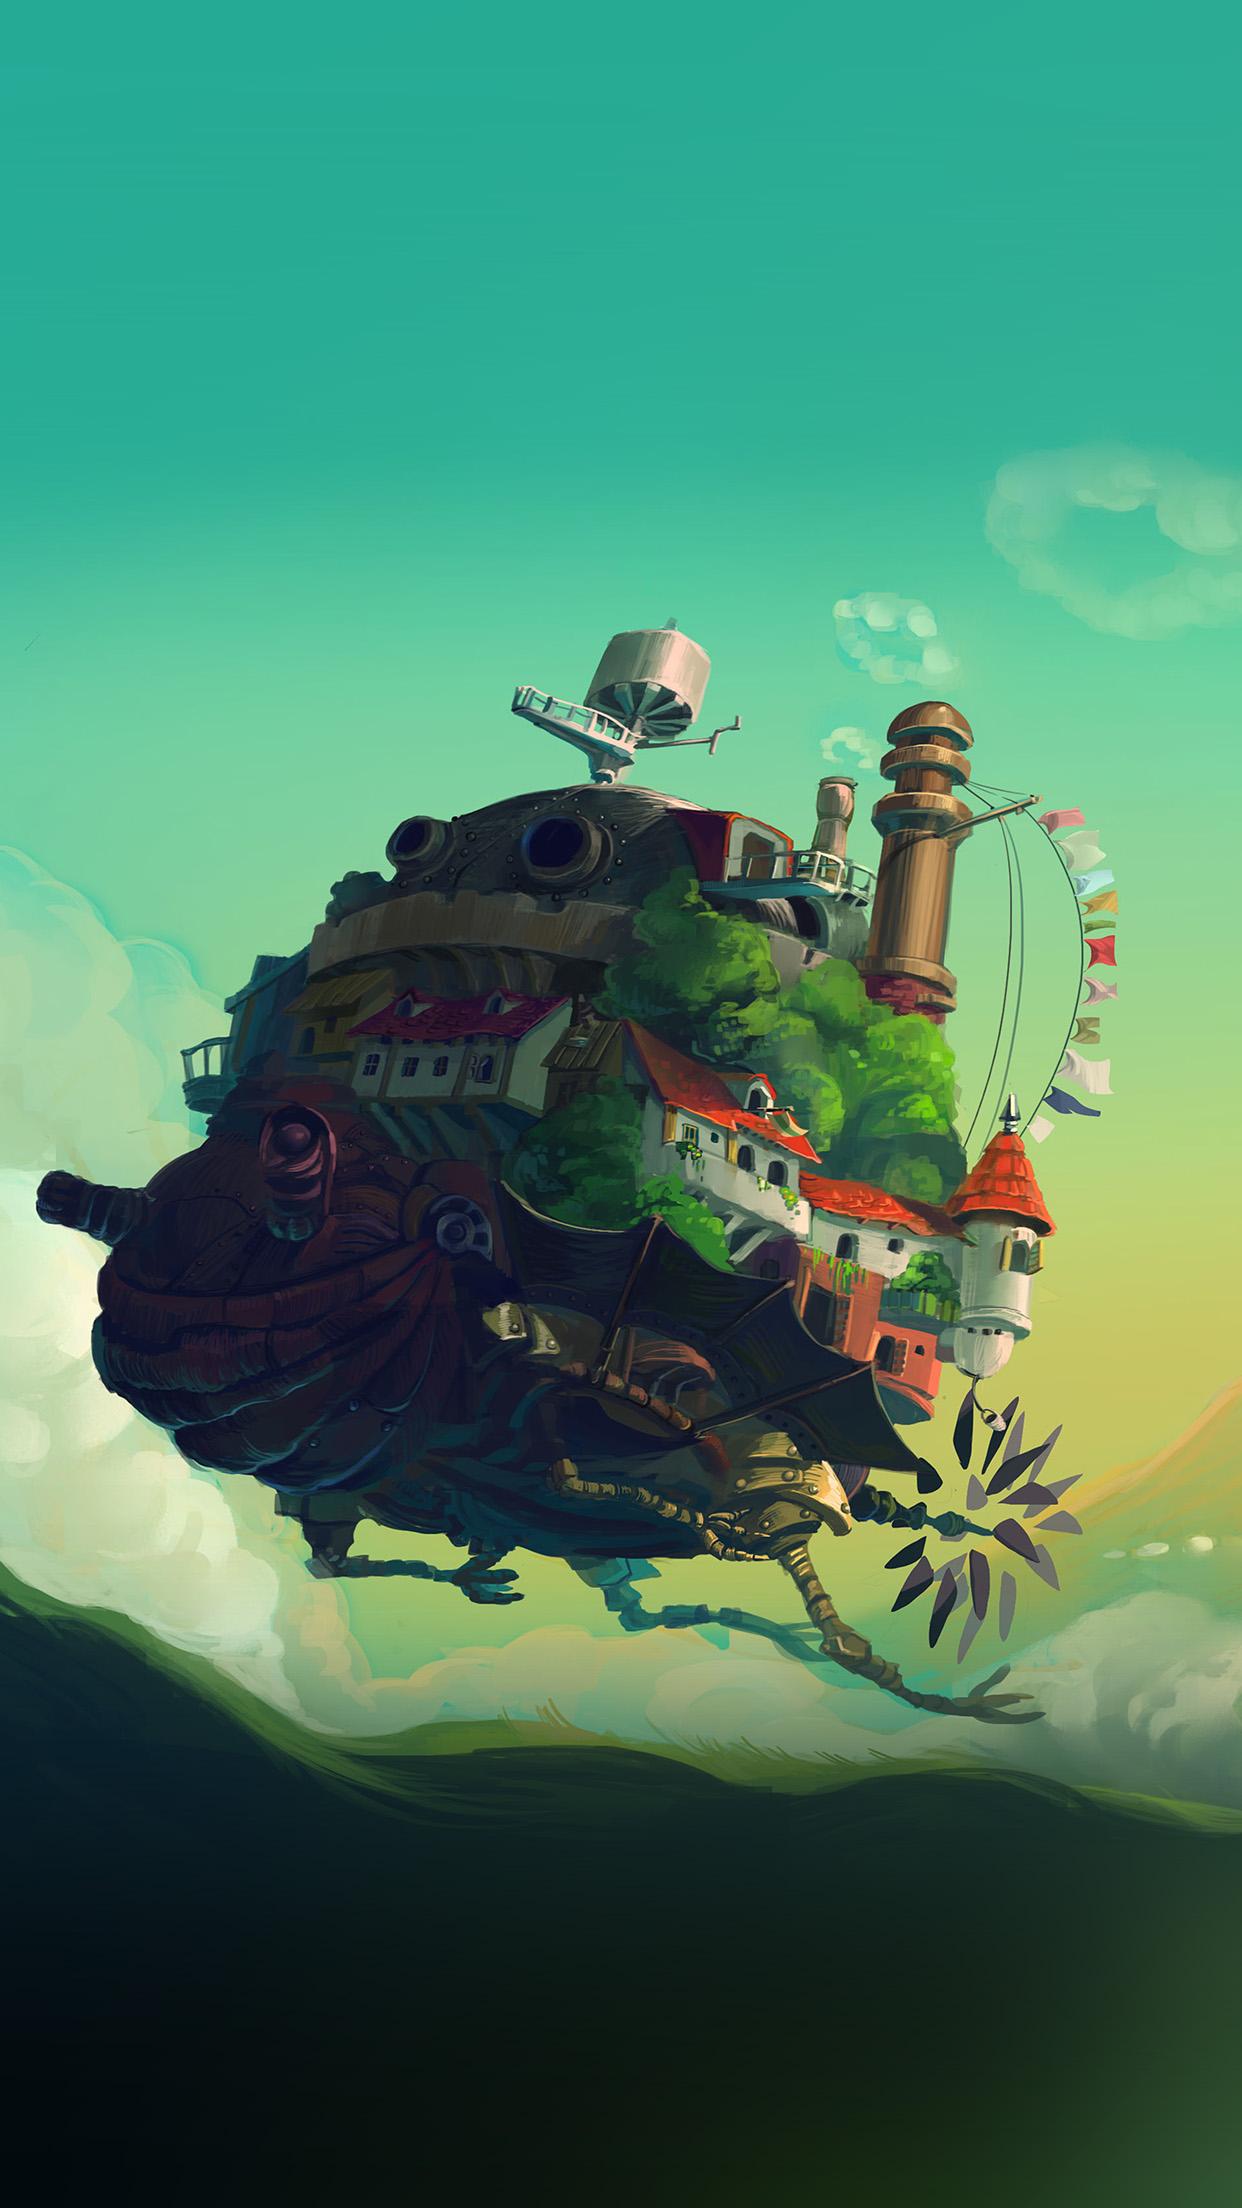 Studio Ghibli Castle Anime Green Peace Art Illustration Android Wallpaper